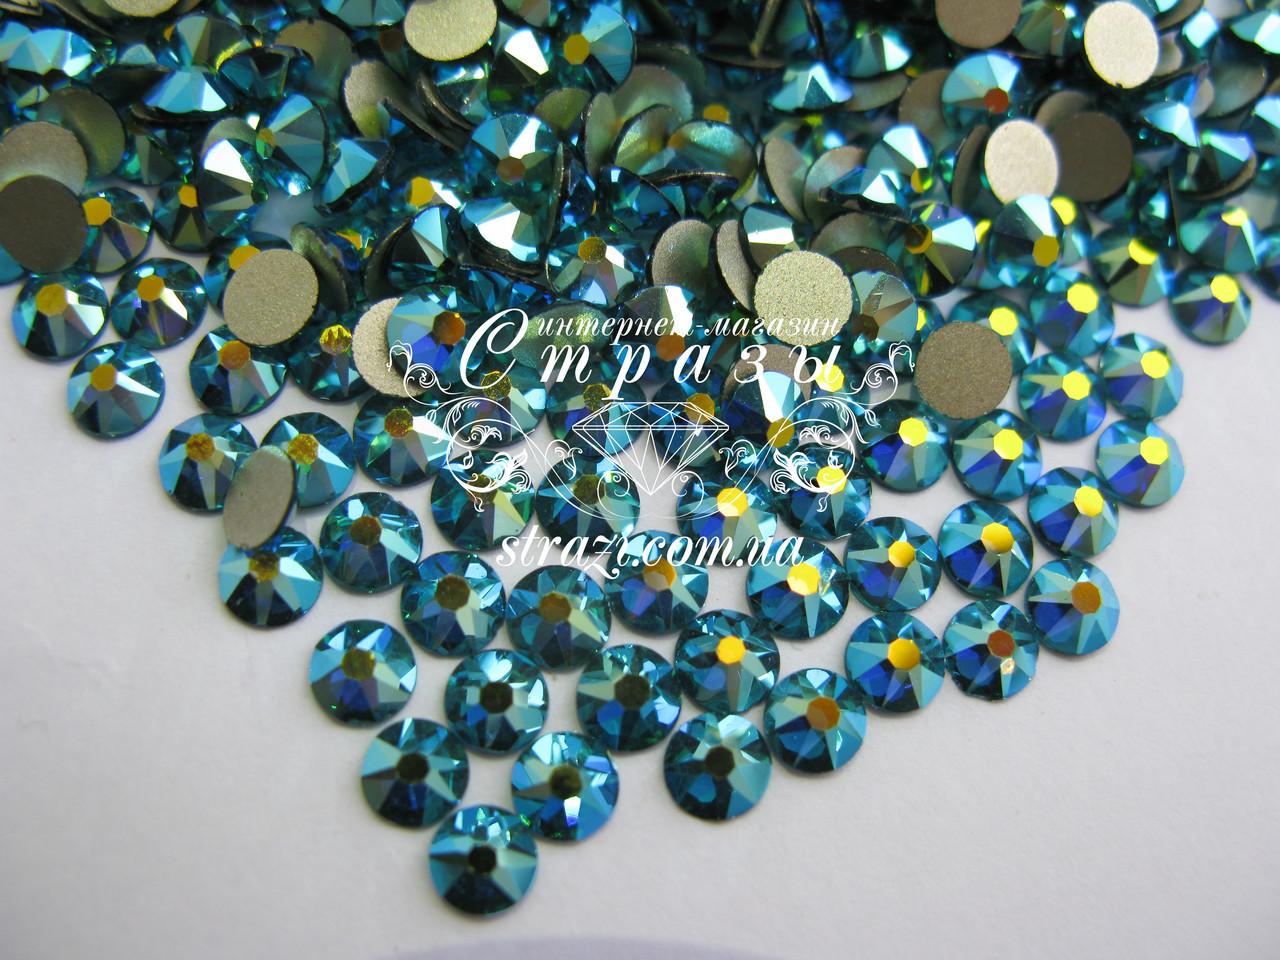 Стразы ss20 Blue Zircon AB, Xirius, NEW, 16 граней, 100шт. (5,0мм)